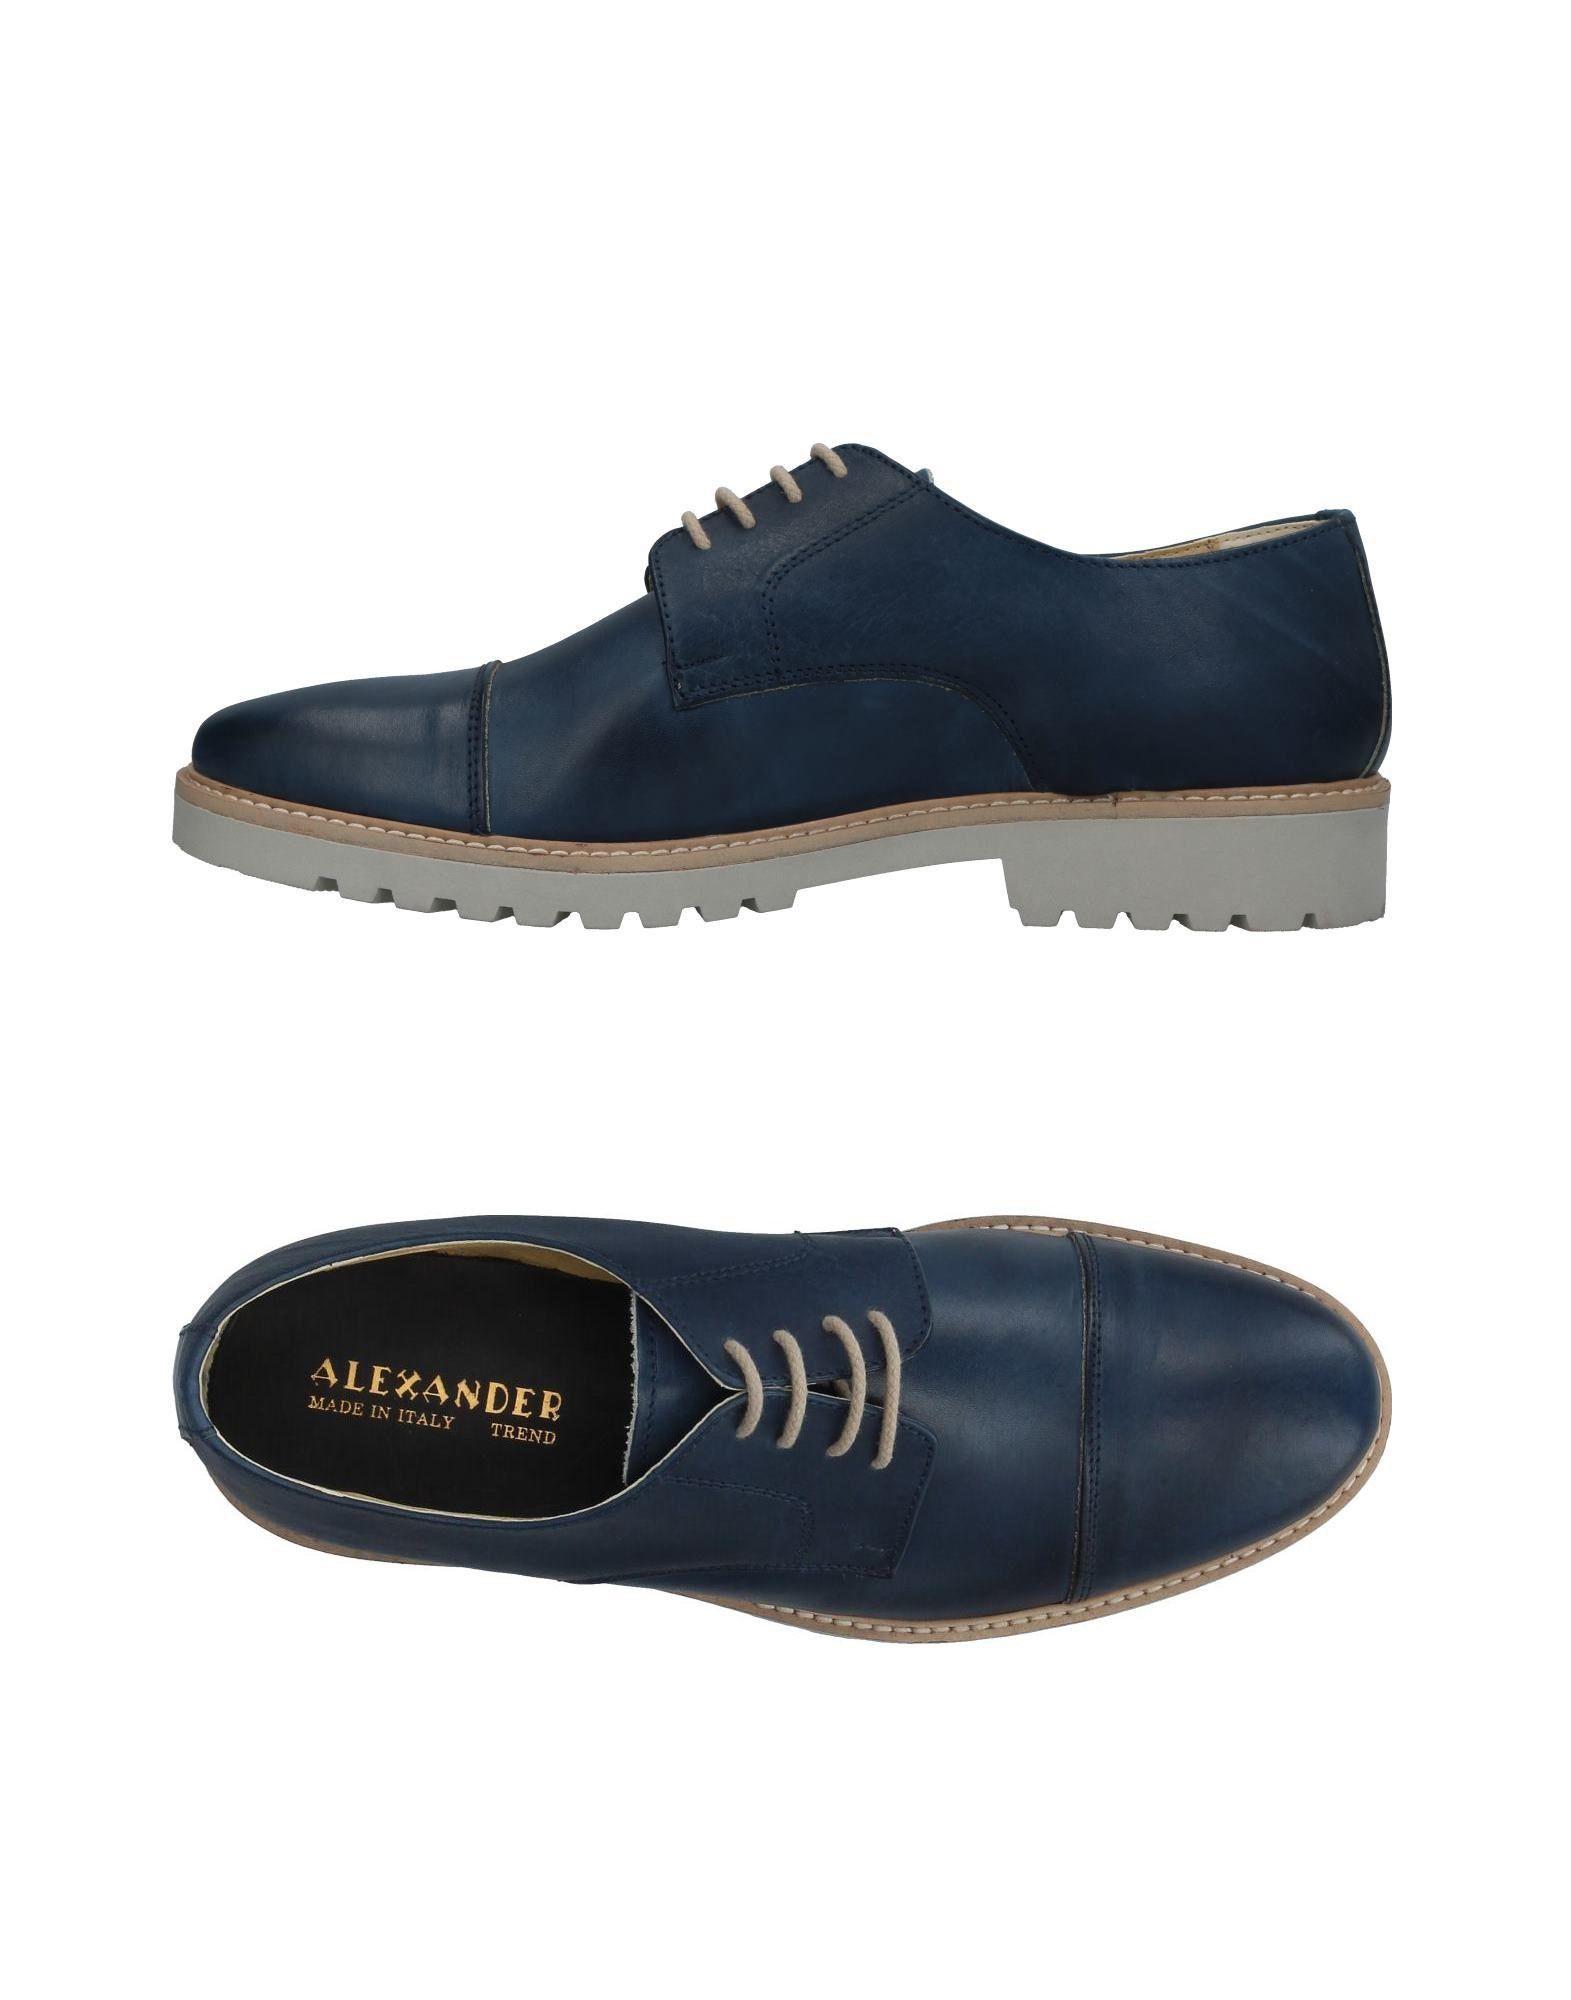 Stringate Alexander Trend Uomo - 11404791NE